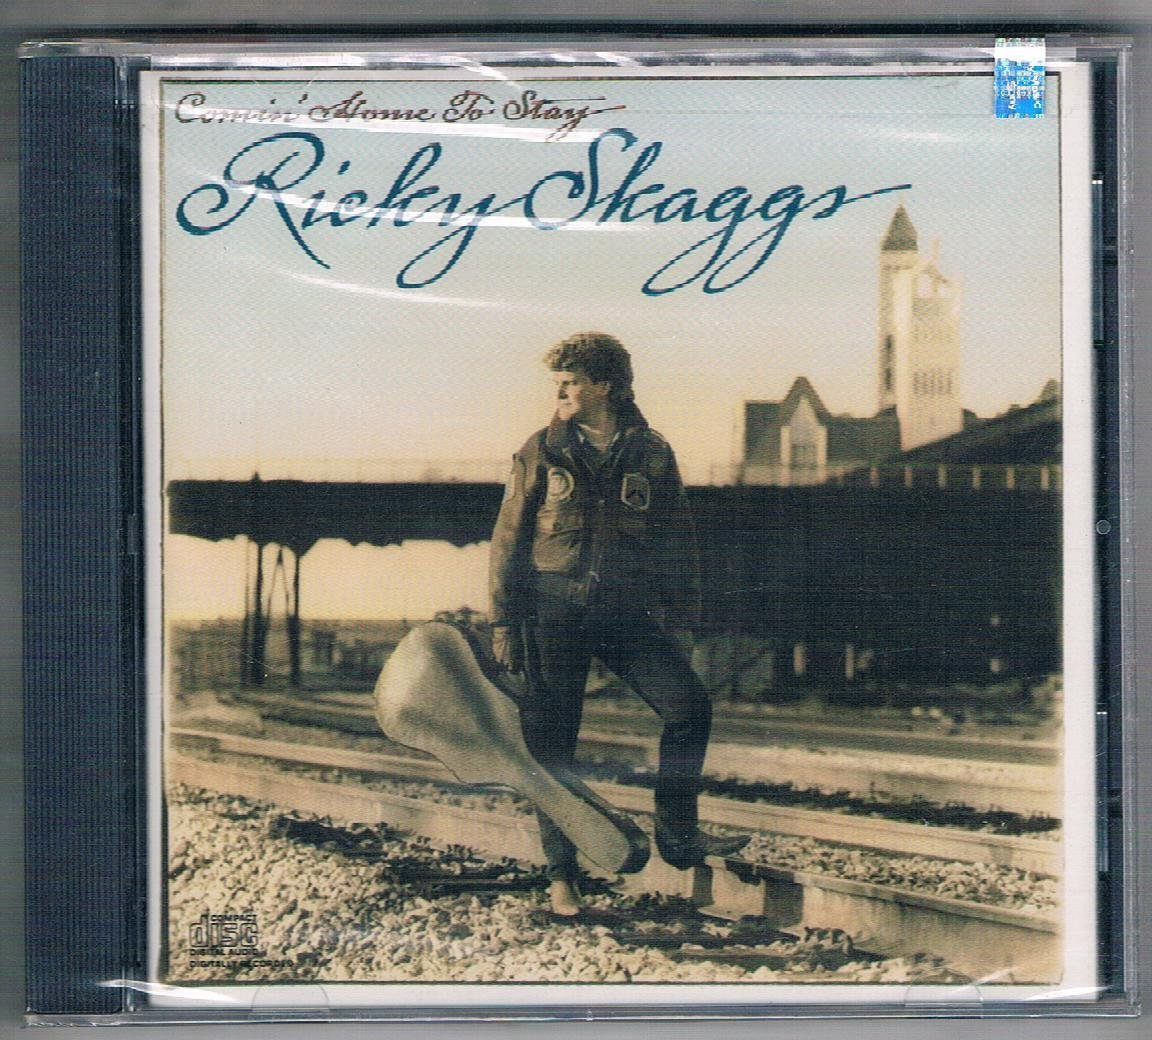 [鑫隆音]西洋CD-瑞奇史卡格斯 Ricky Skaggs : COMIN HOME TO STAY {EK40623}